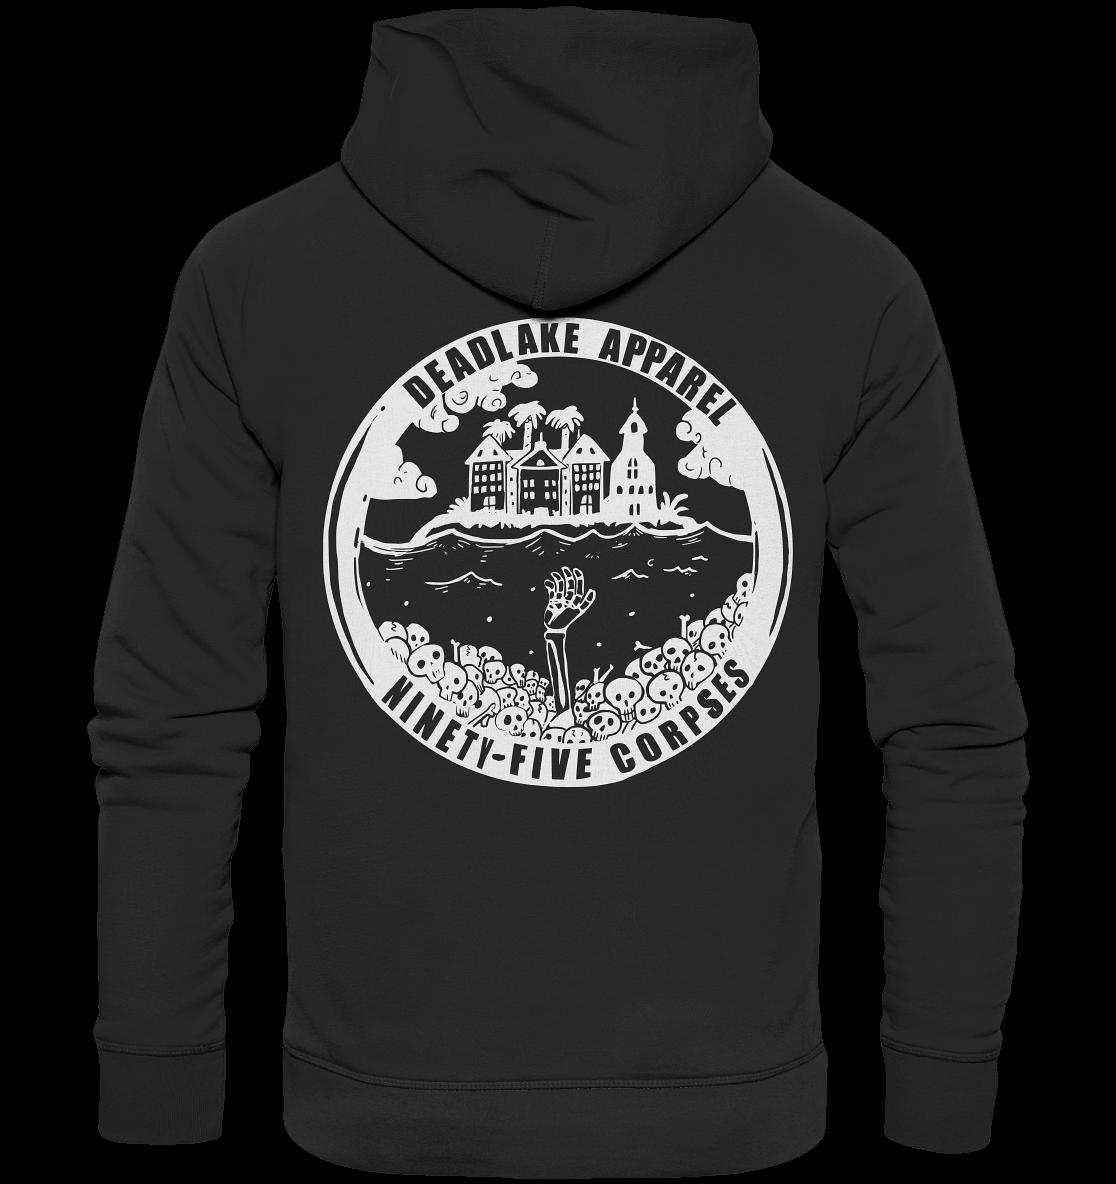 back-organic-fashion-hoodie-272727-1116x.png